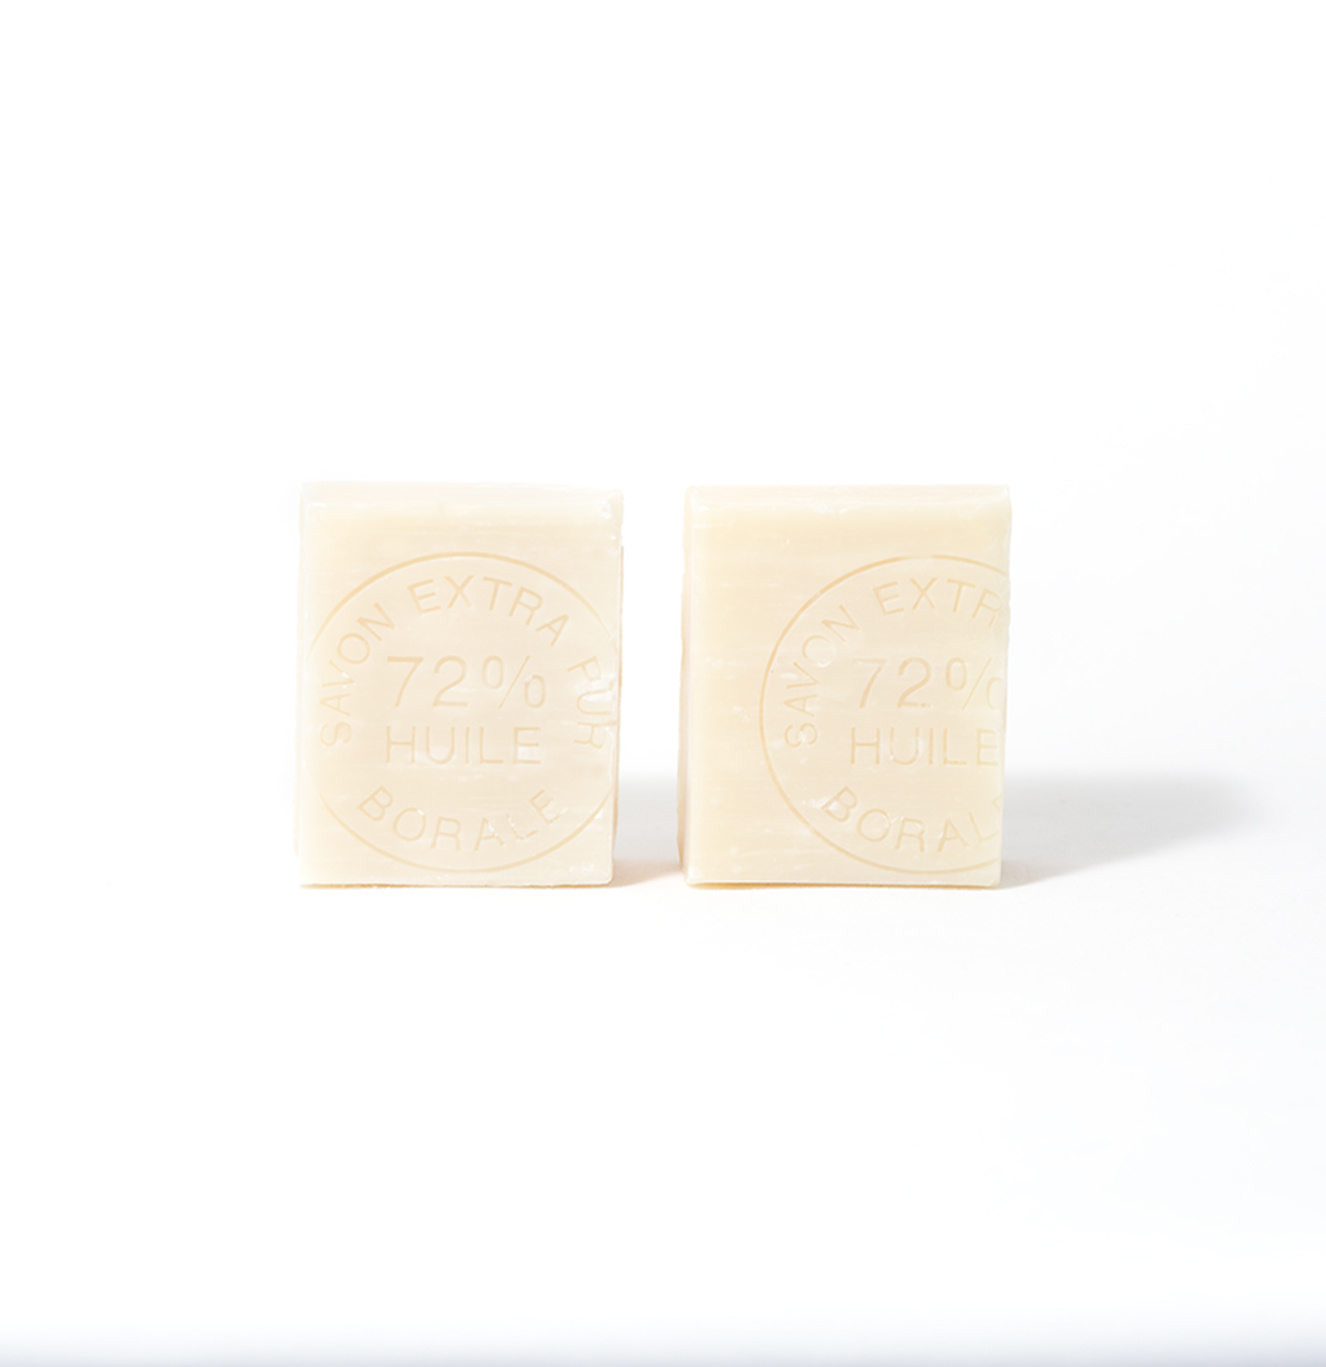 EXTRA PUR SOAP BAR #29 CLASSIQUE 75 G